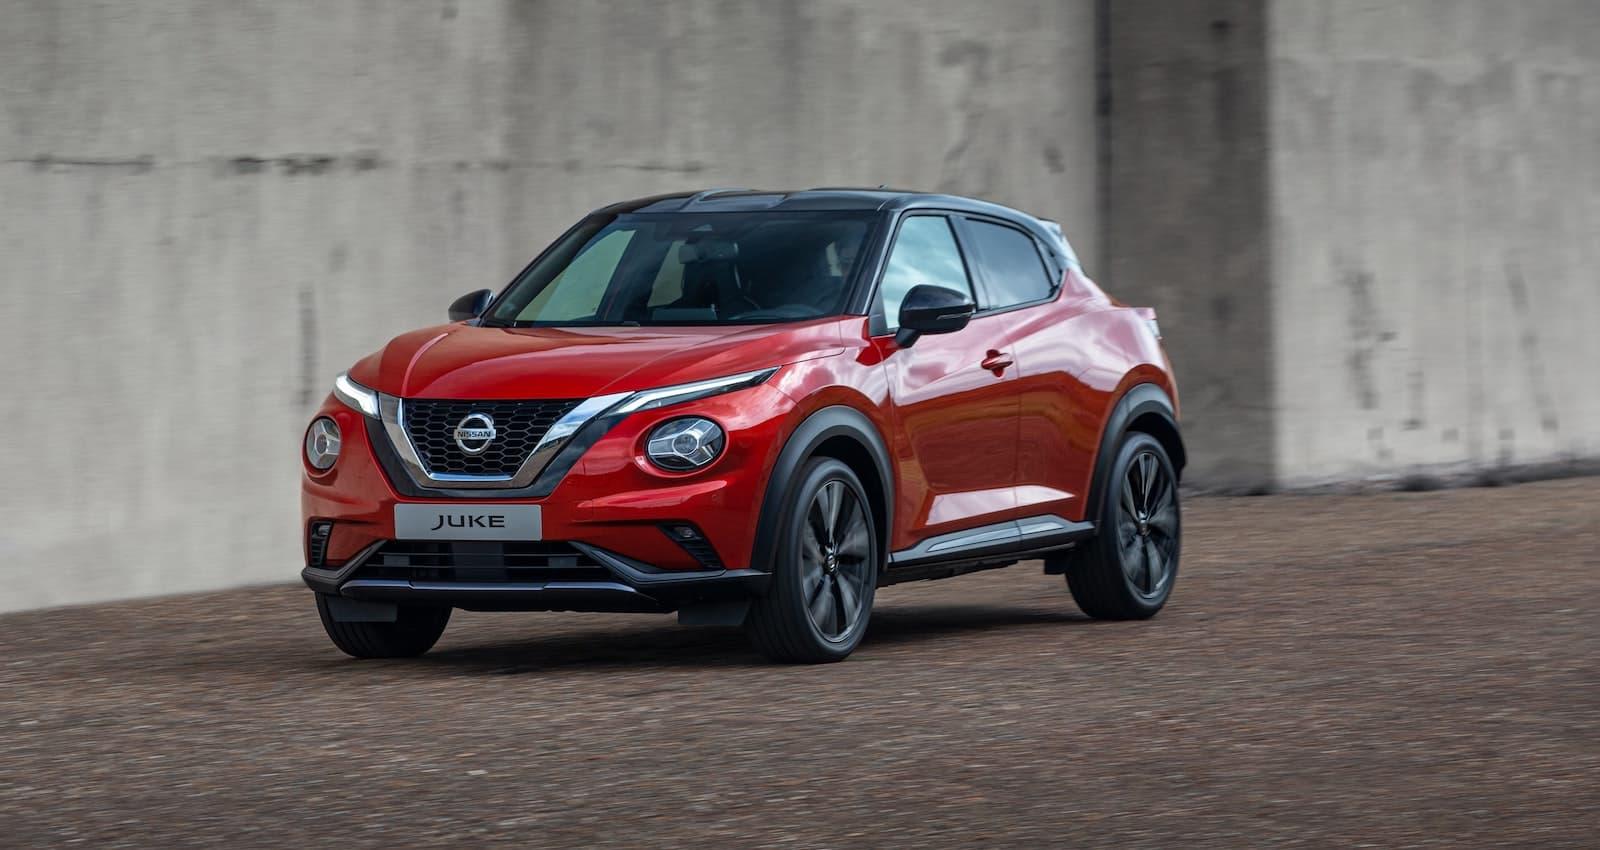 2020 Nissan Juke revealed | The Car Expert